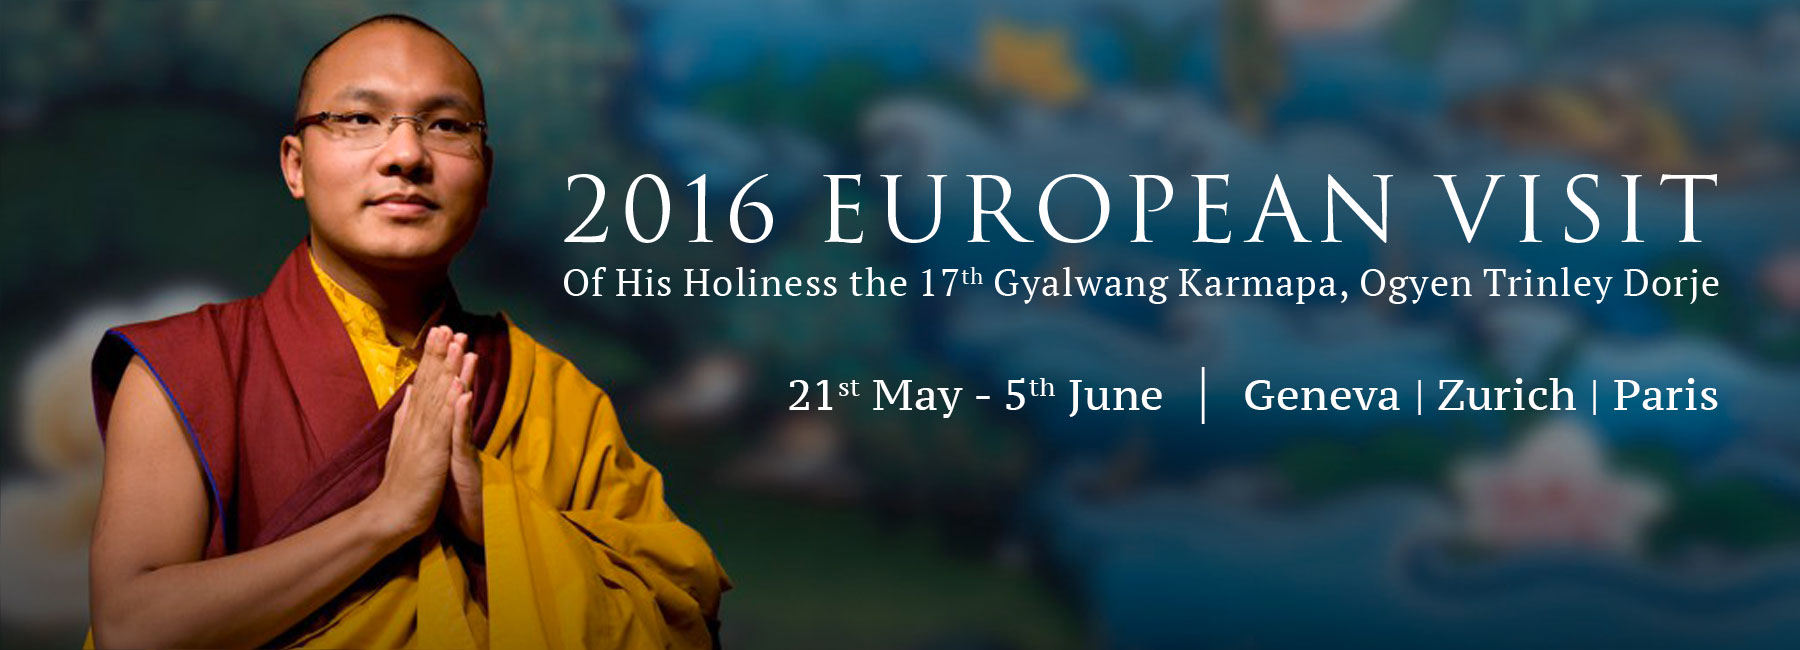 Karmapa European Visit 2016